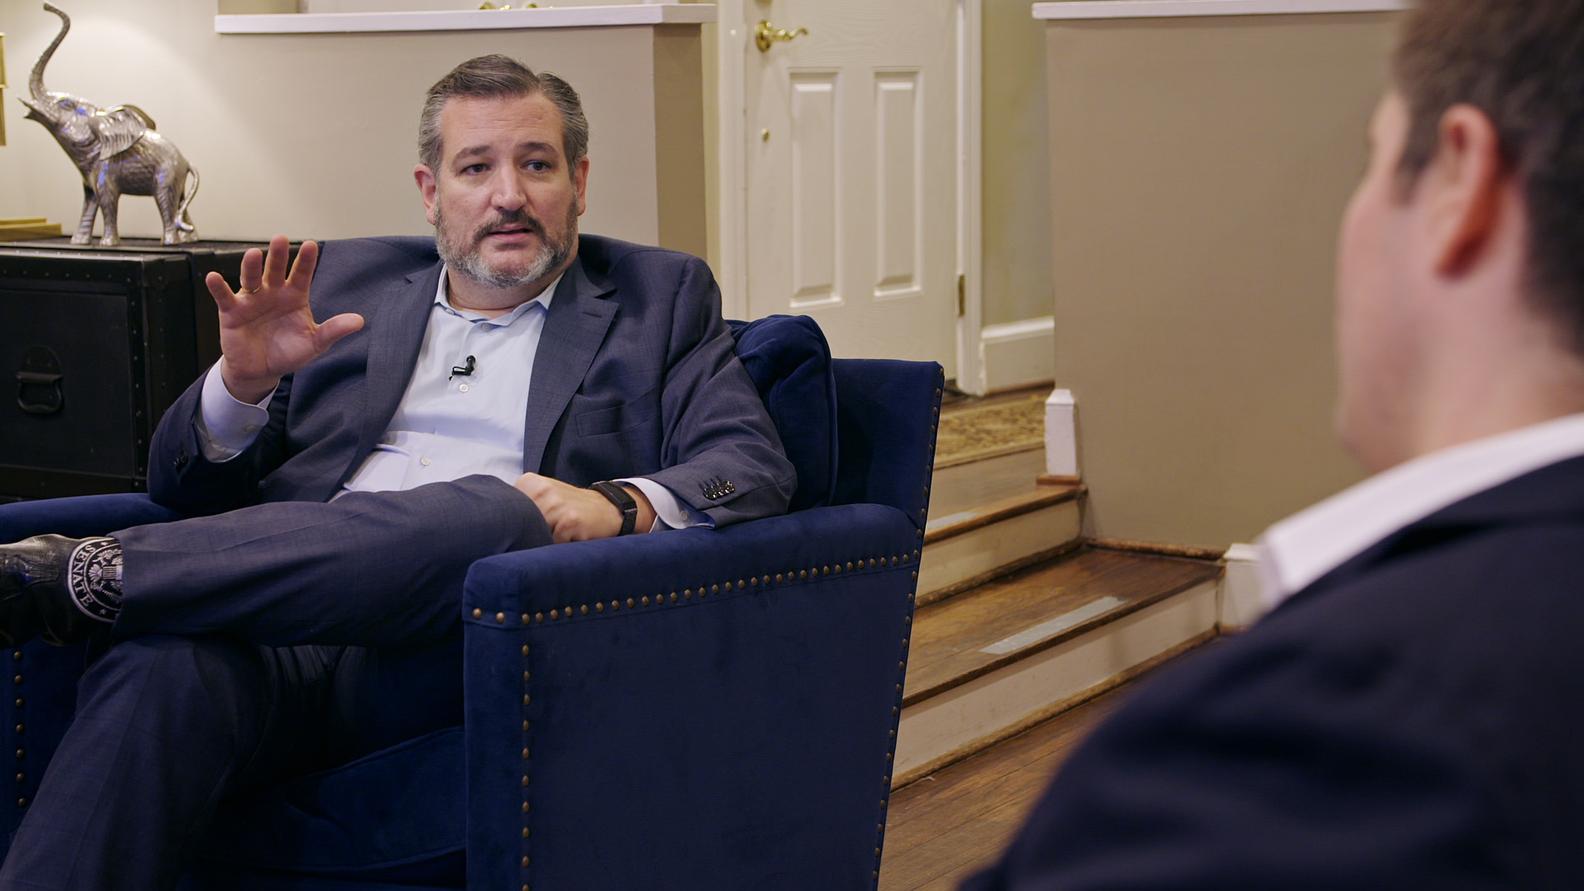 Senator Ted Cruz (R-TX), Axios National Political correspondent Jonathan Swan